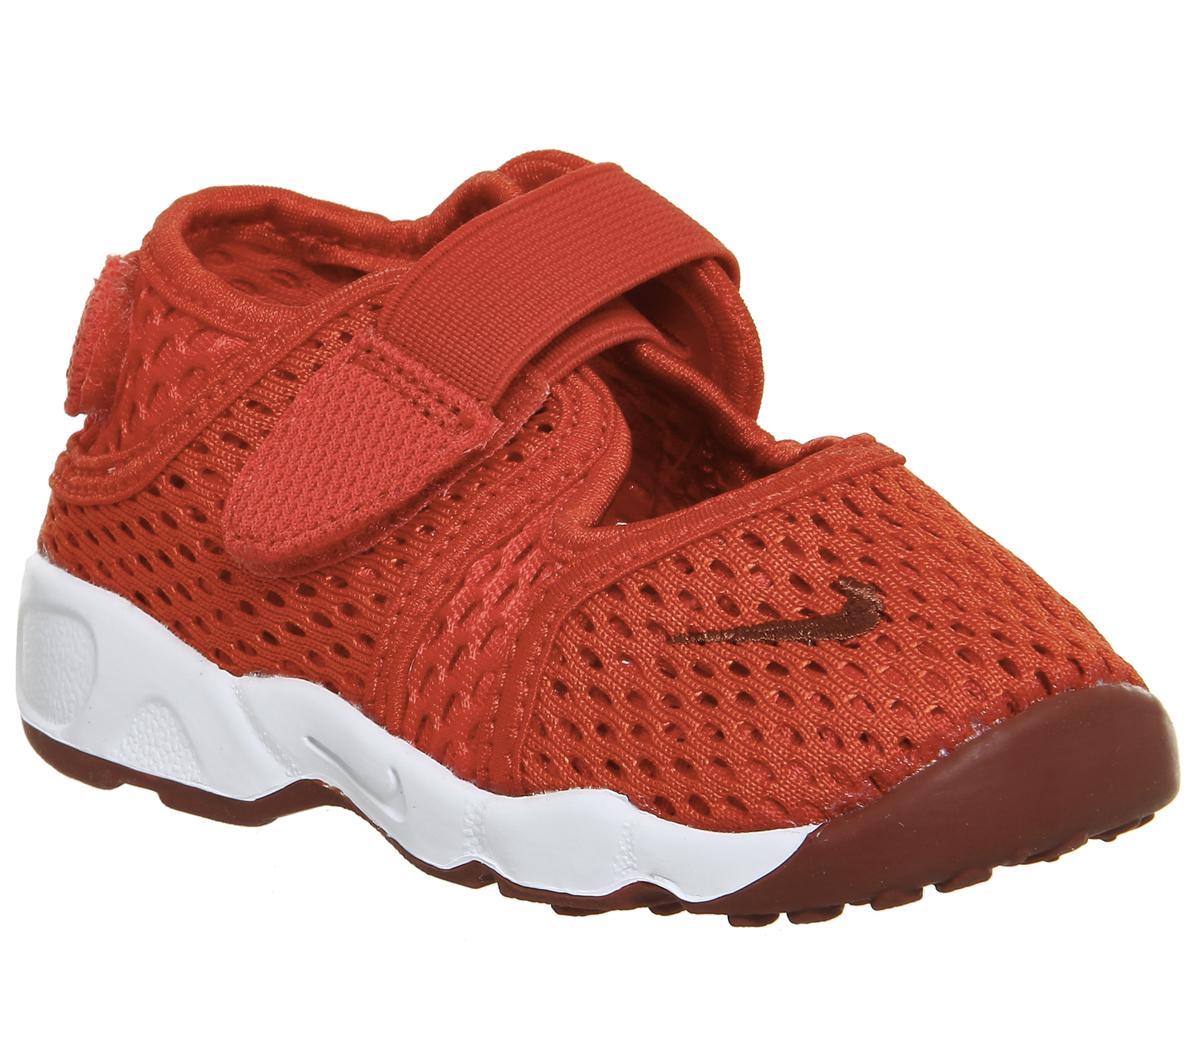 Nike Rift Infant Shoes Red White - Unisex